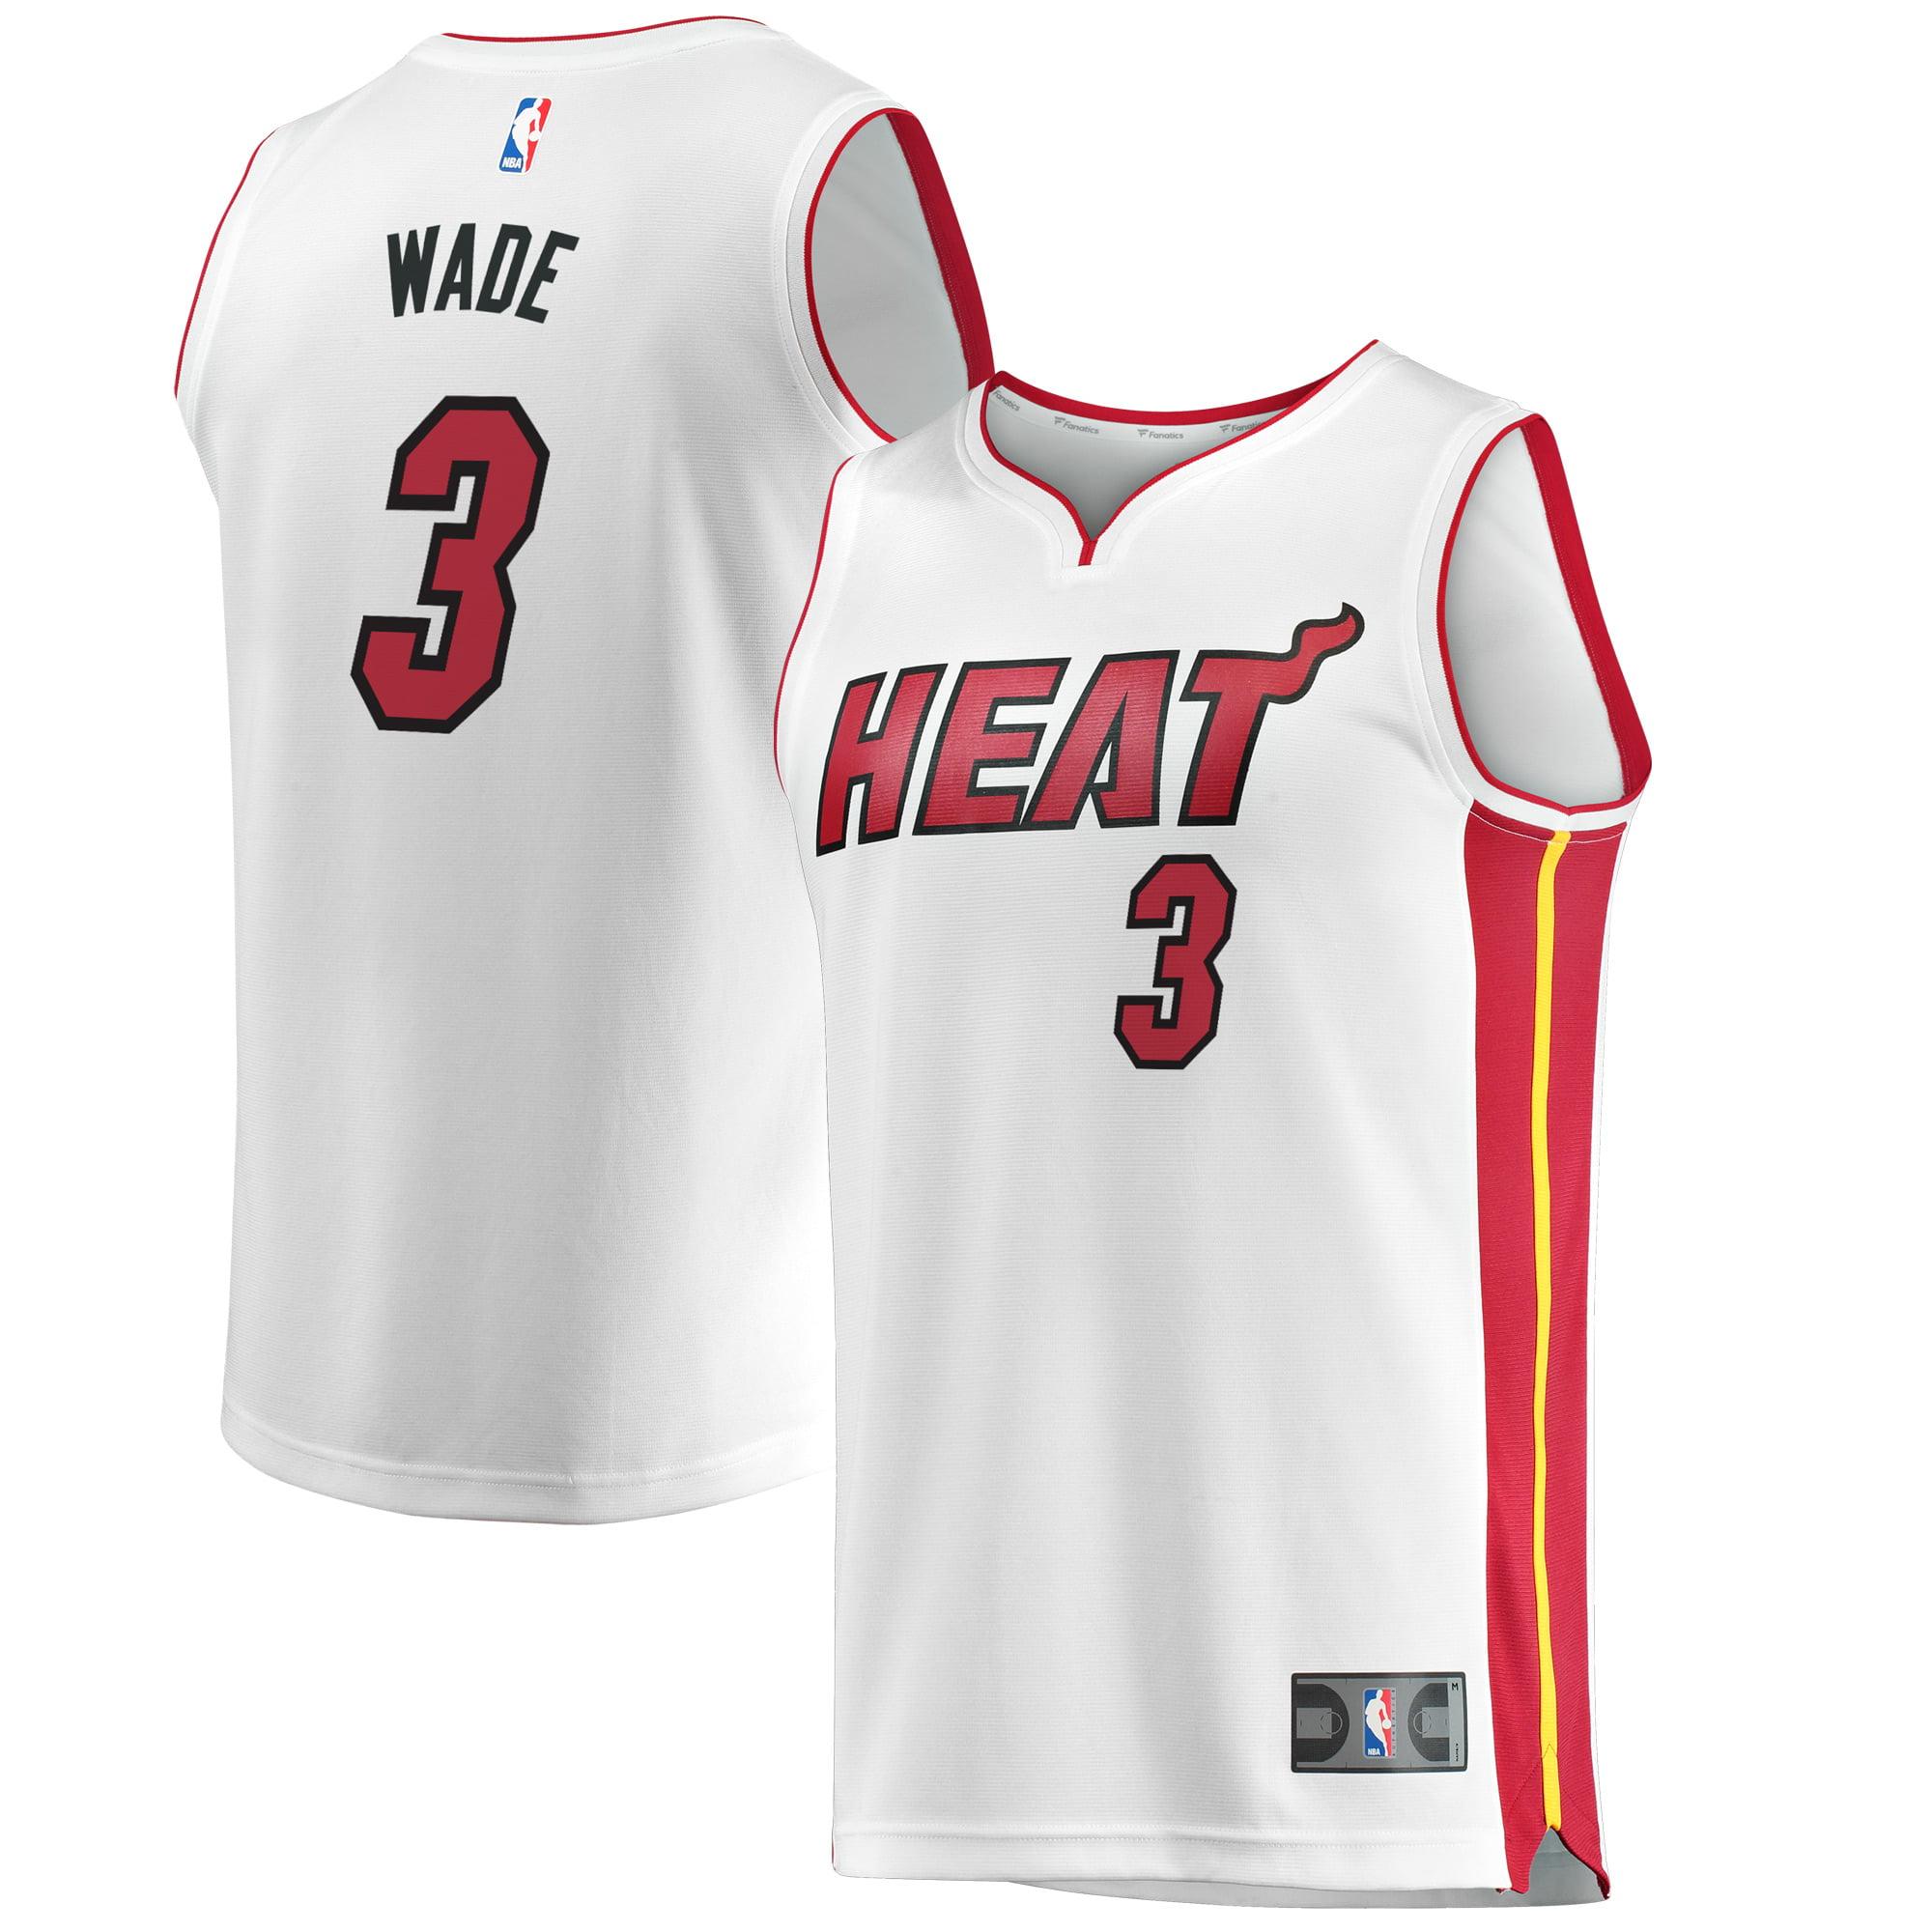 Dwyane Wade Miami Heat Fanatics Branded Youth Fast Break Replica Jersey - Association Edition - White